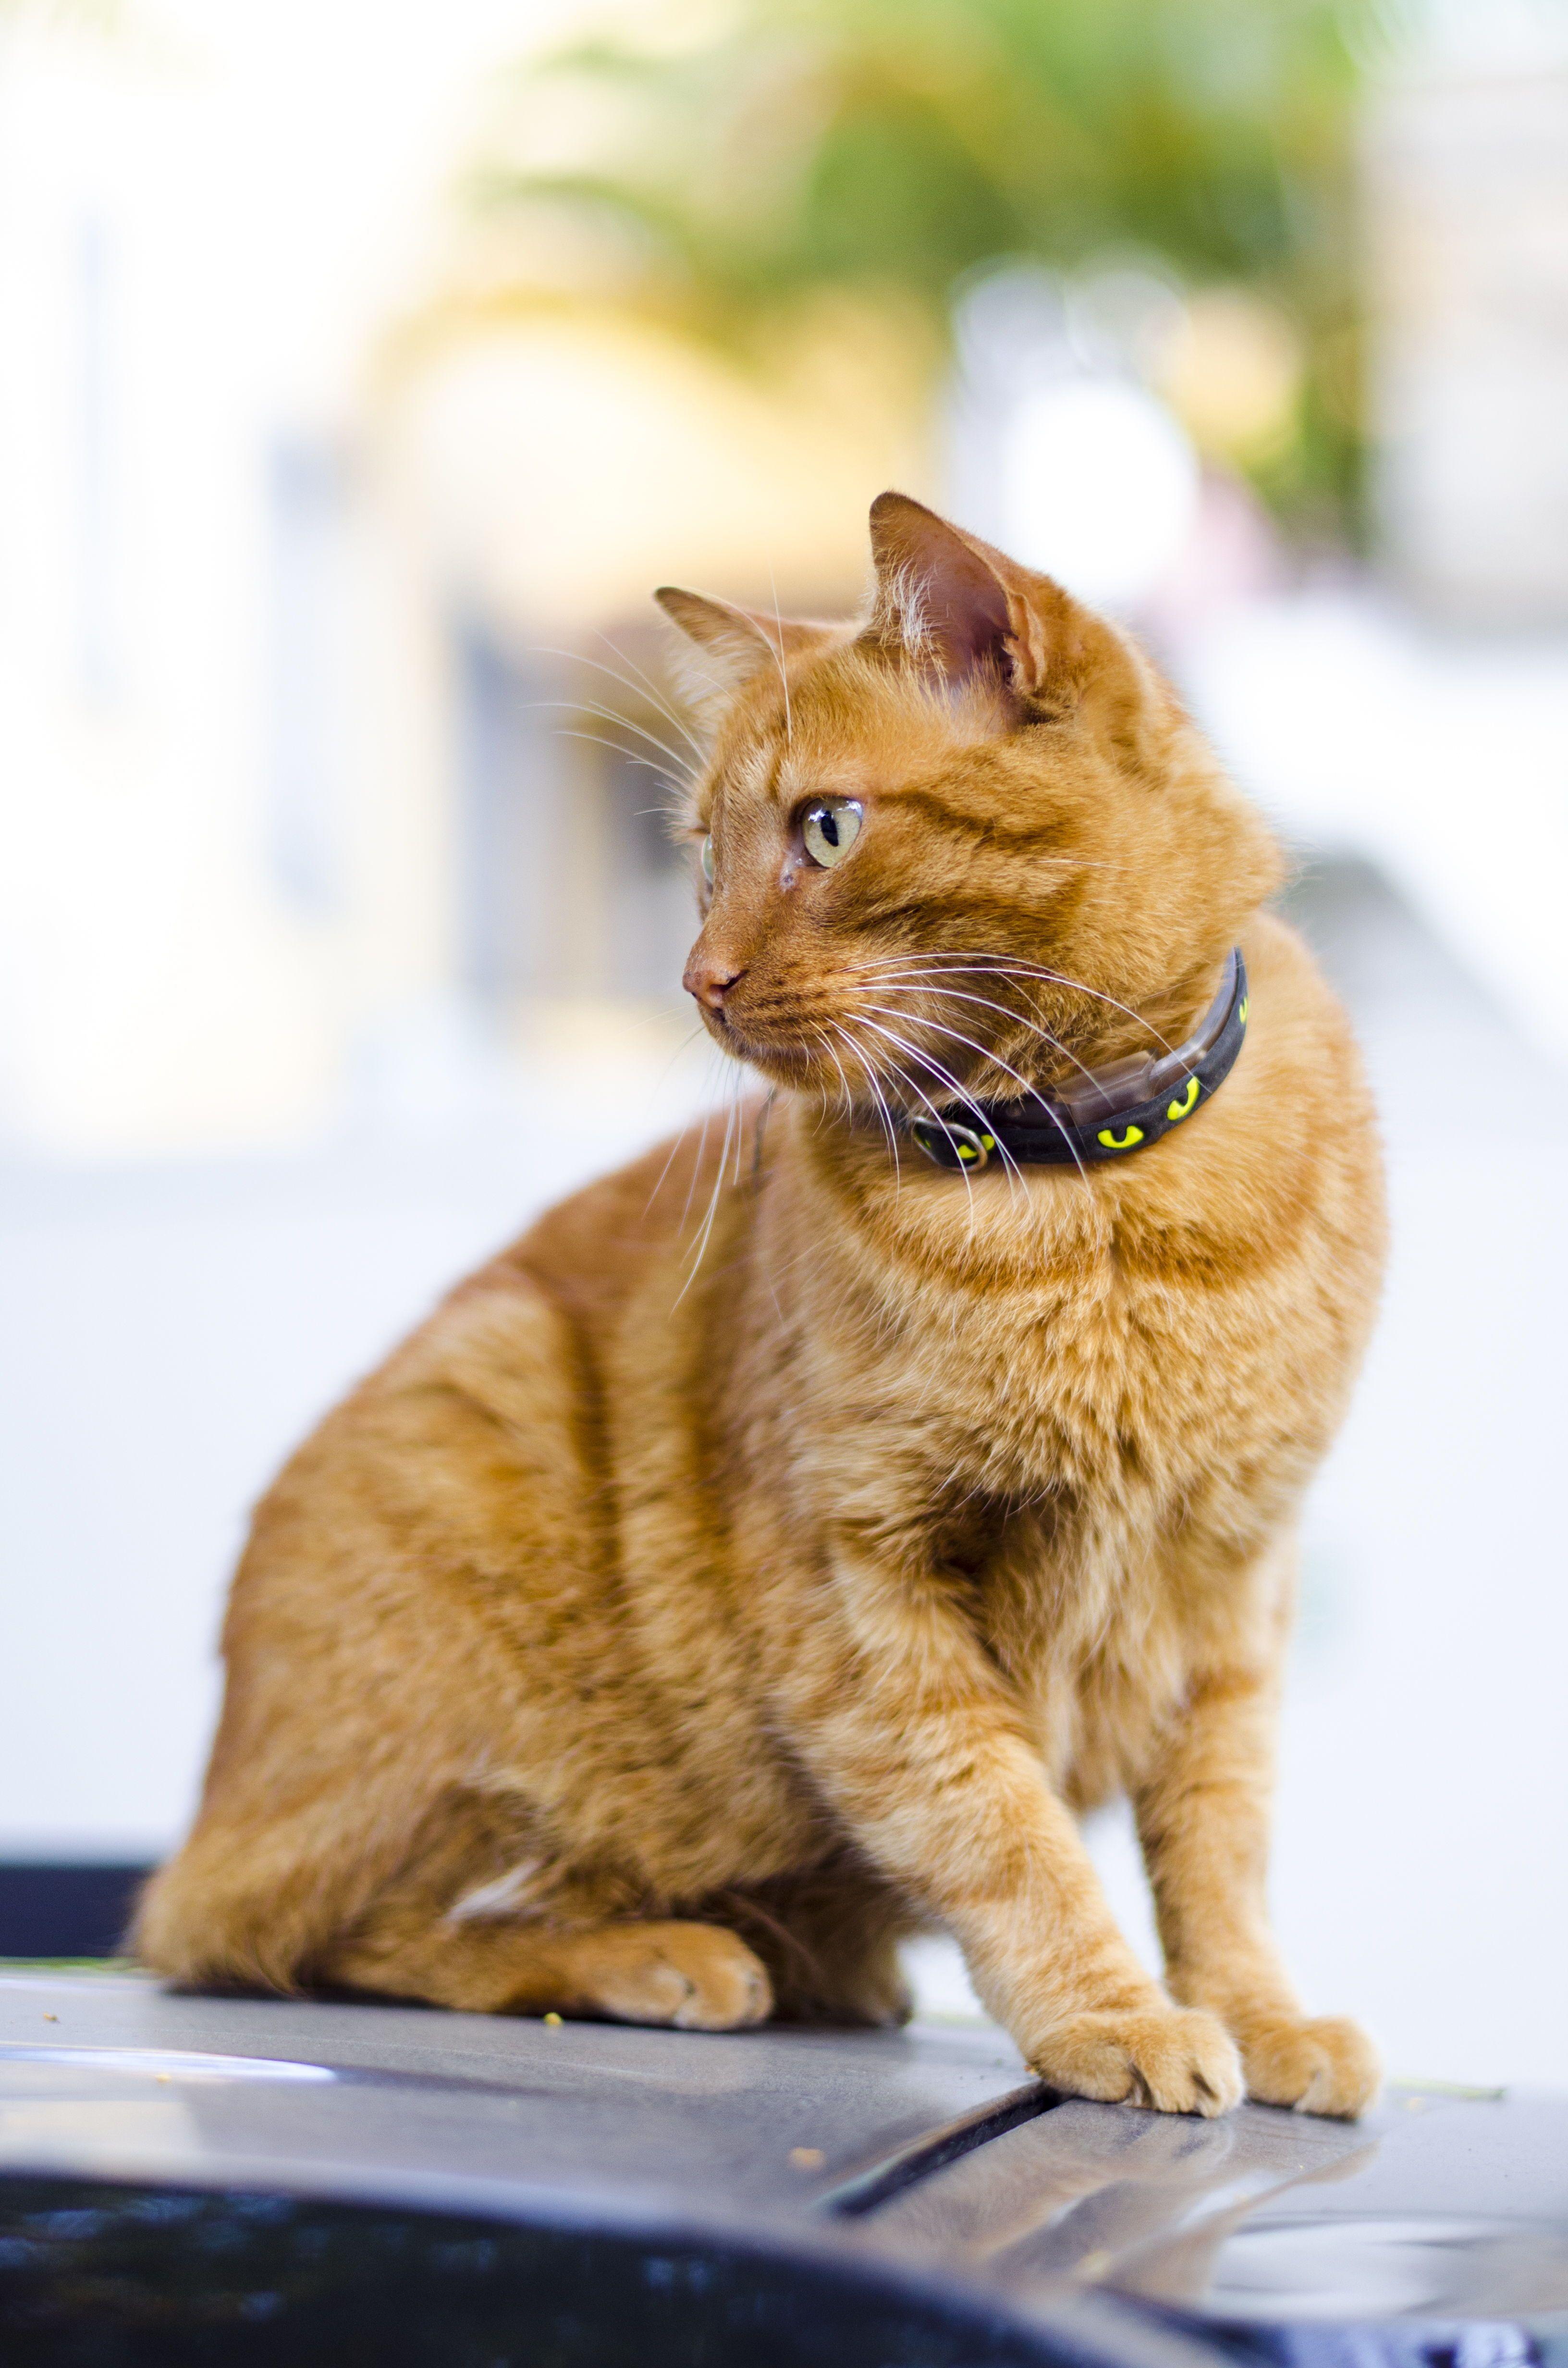 Orange Tabby Cat Wearing Black Collar In 2020 Cat Care Cat Has Fleas Cats